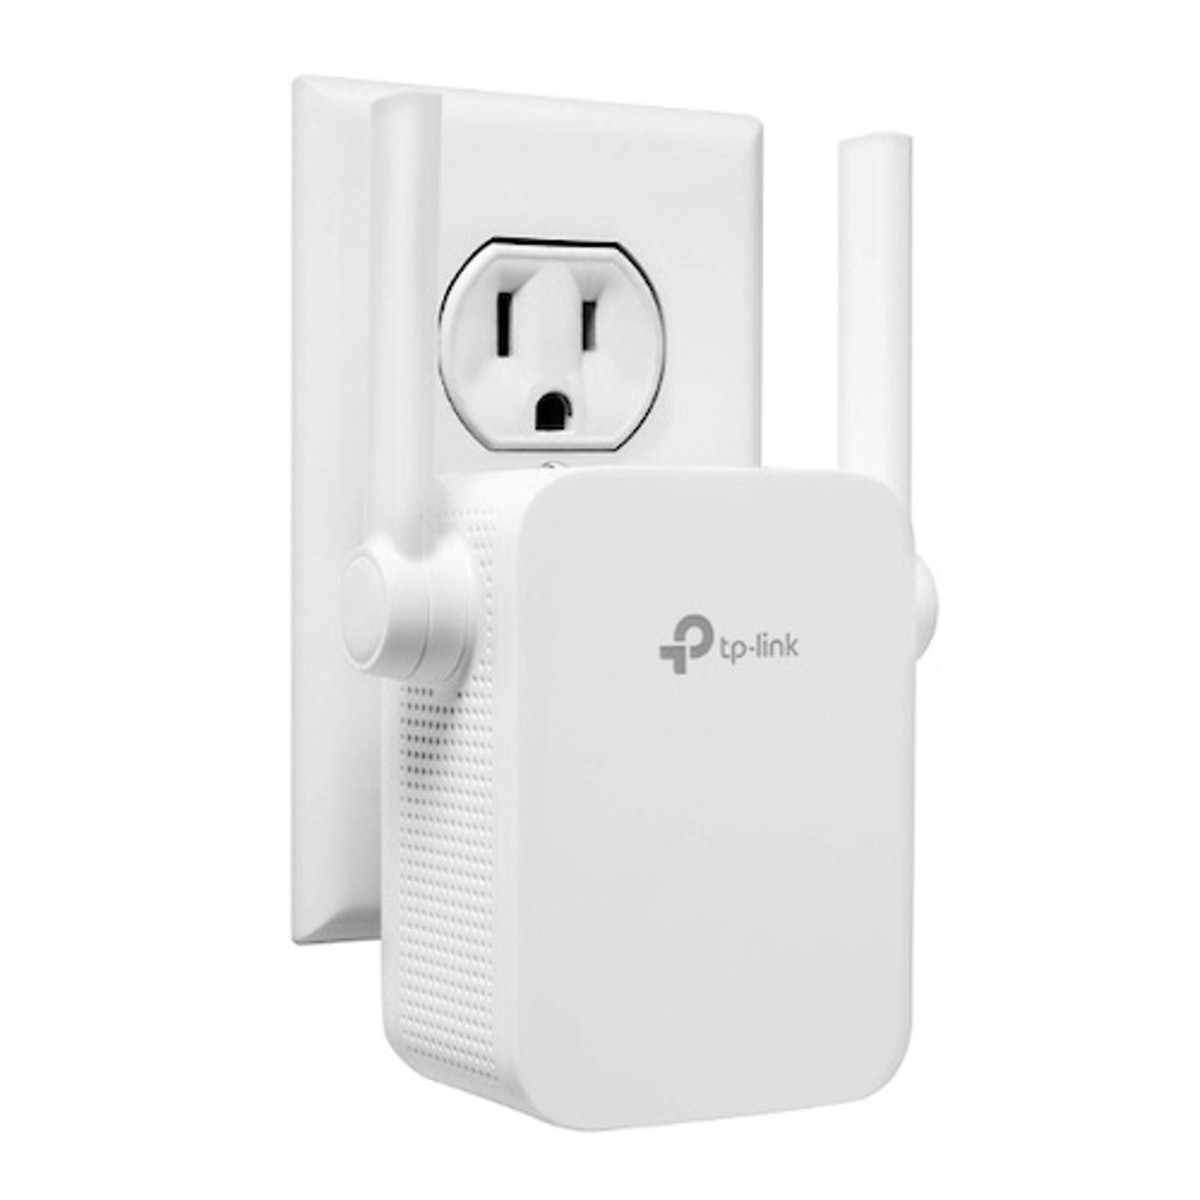 TP-Link N300 WiFi Range Extender